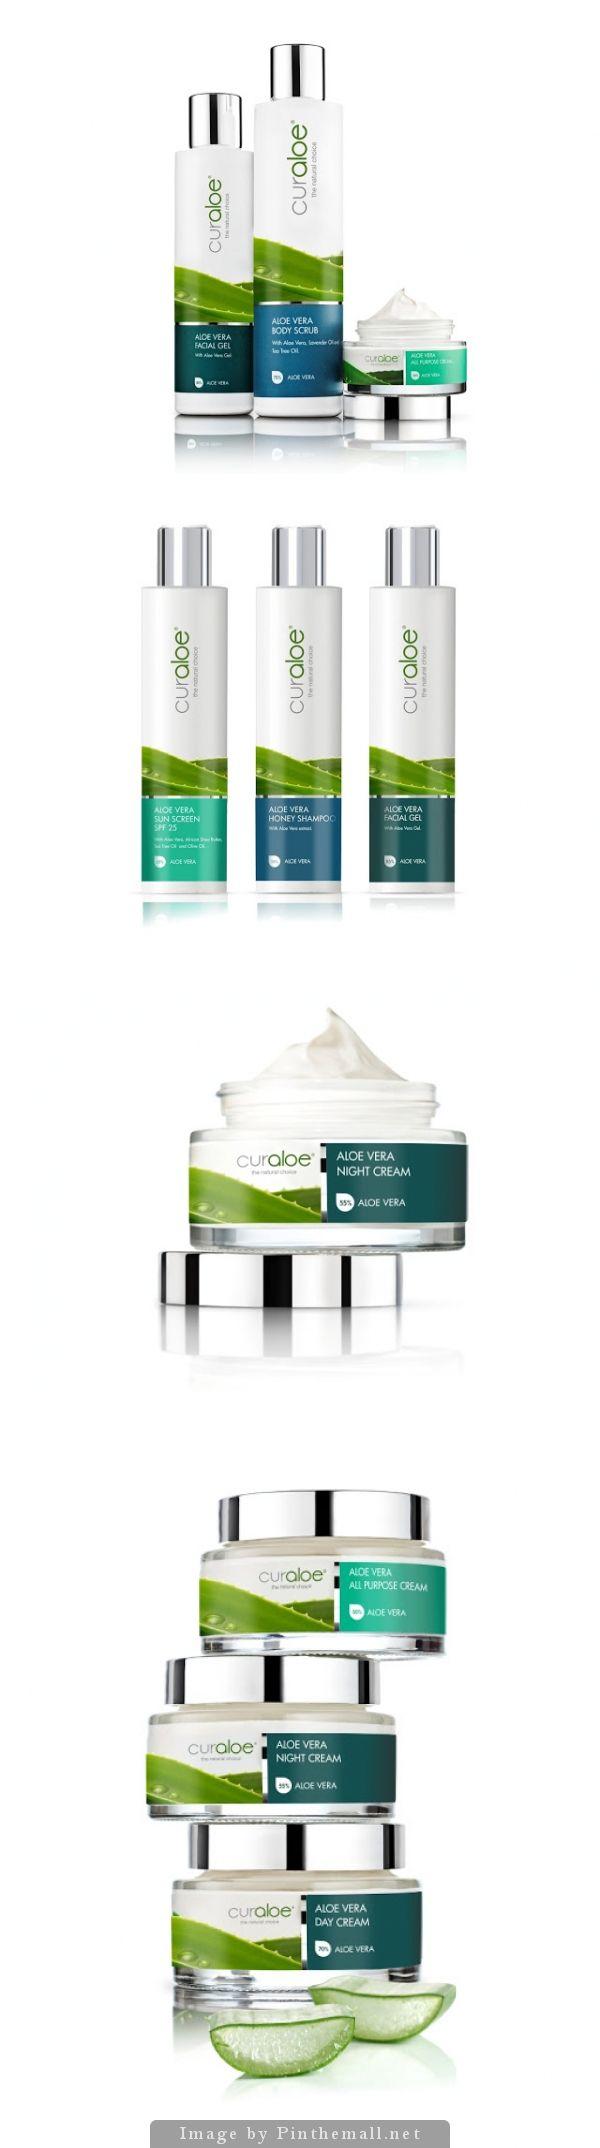 Curaloe Skin Care Line